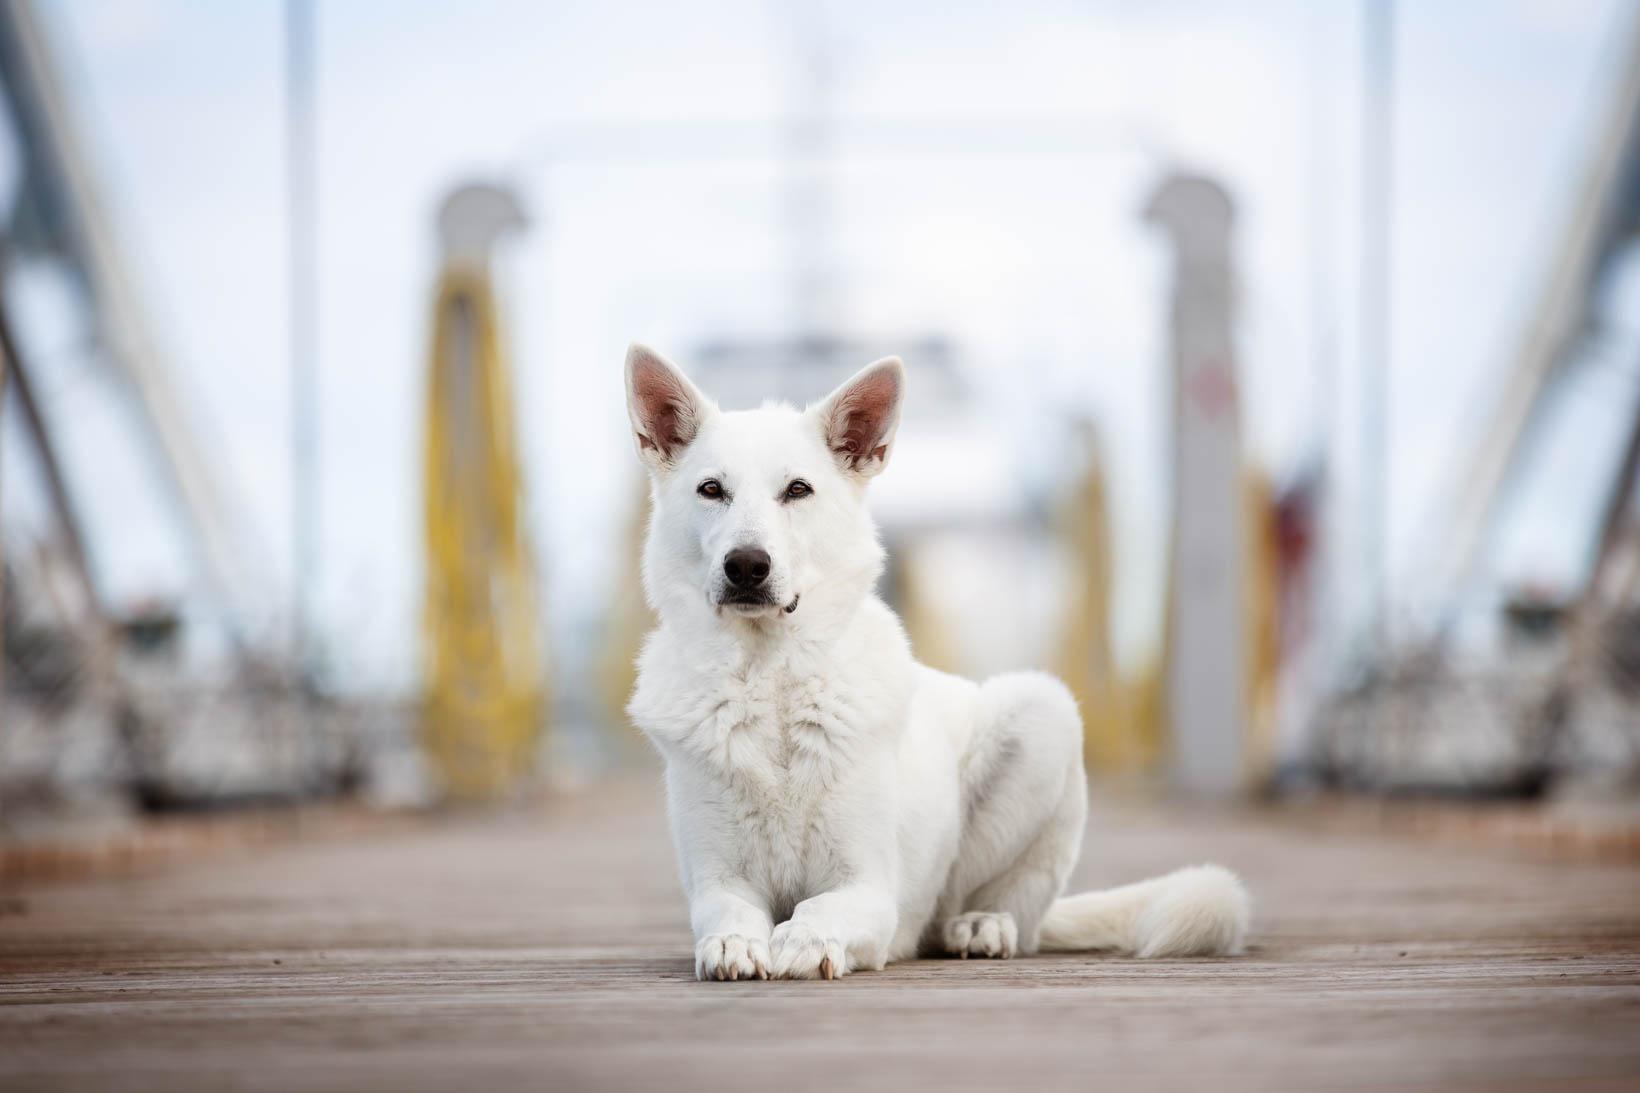 wie Hund fotografieren_Tierfotografie_Hundefotos klappen nicht